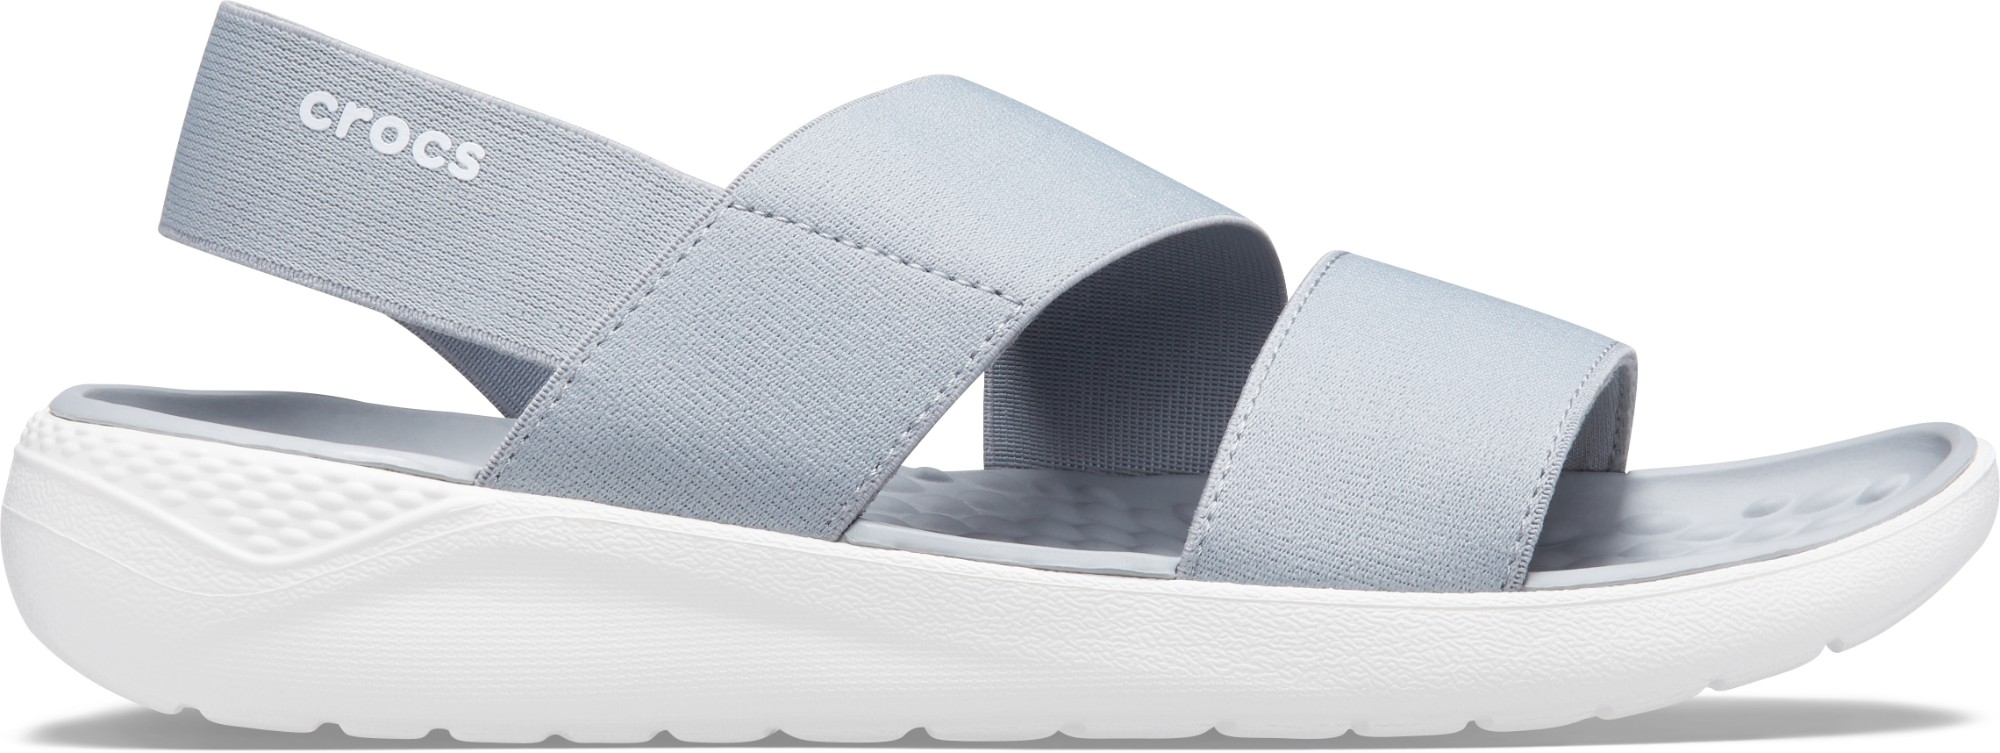 Crocs™ Literide Stretch Sandal Womens Light Grey/White 35